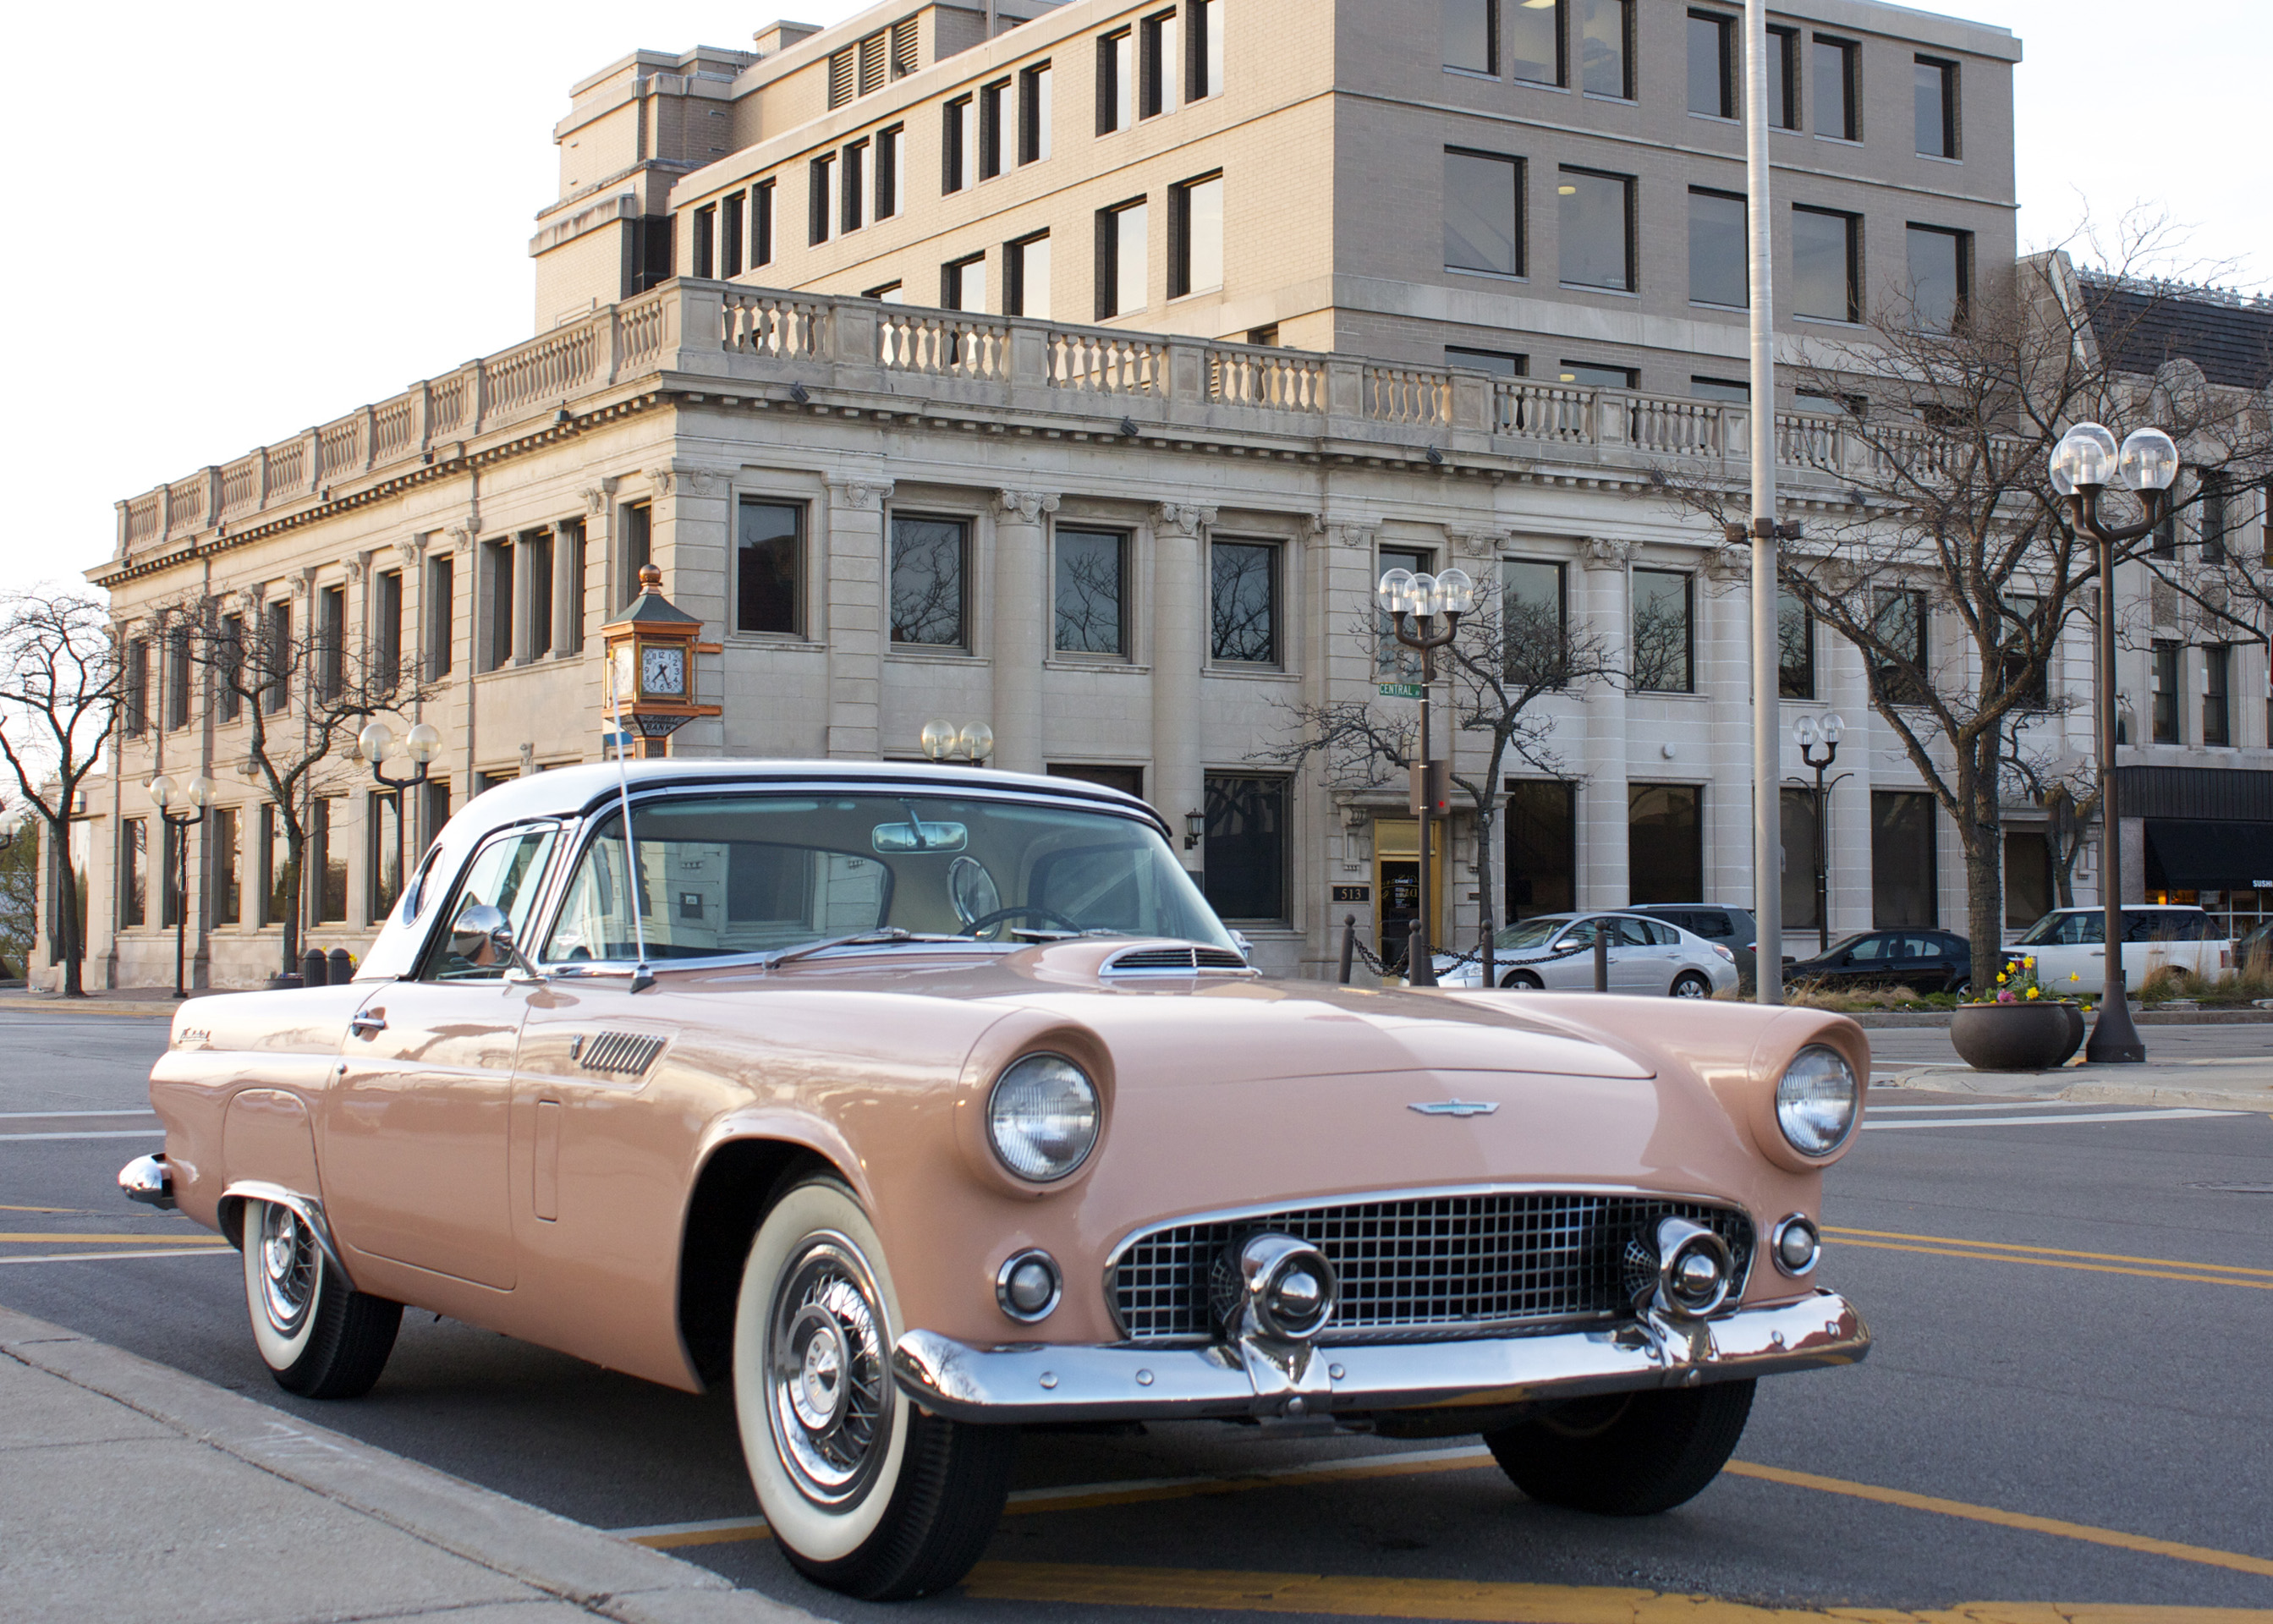 Deb Powless' 1956 Ford Thunderbird